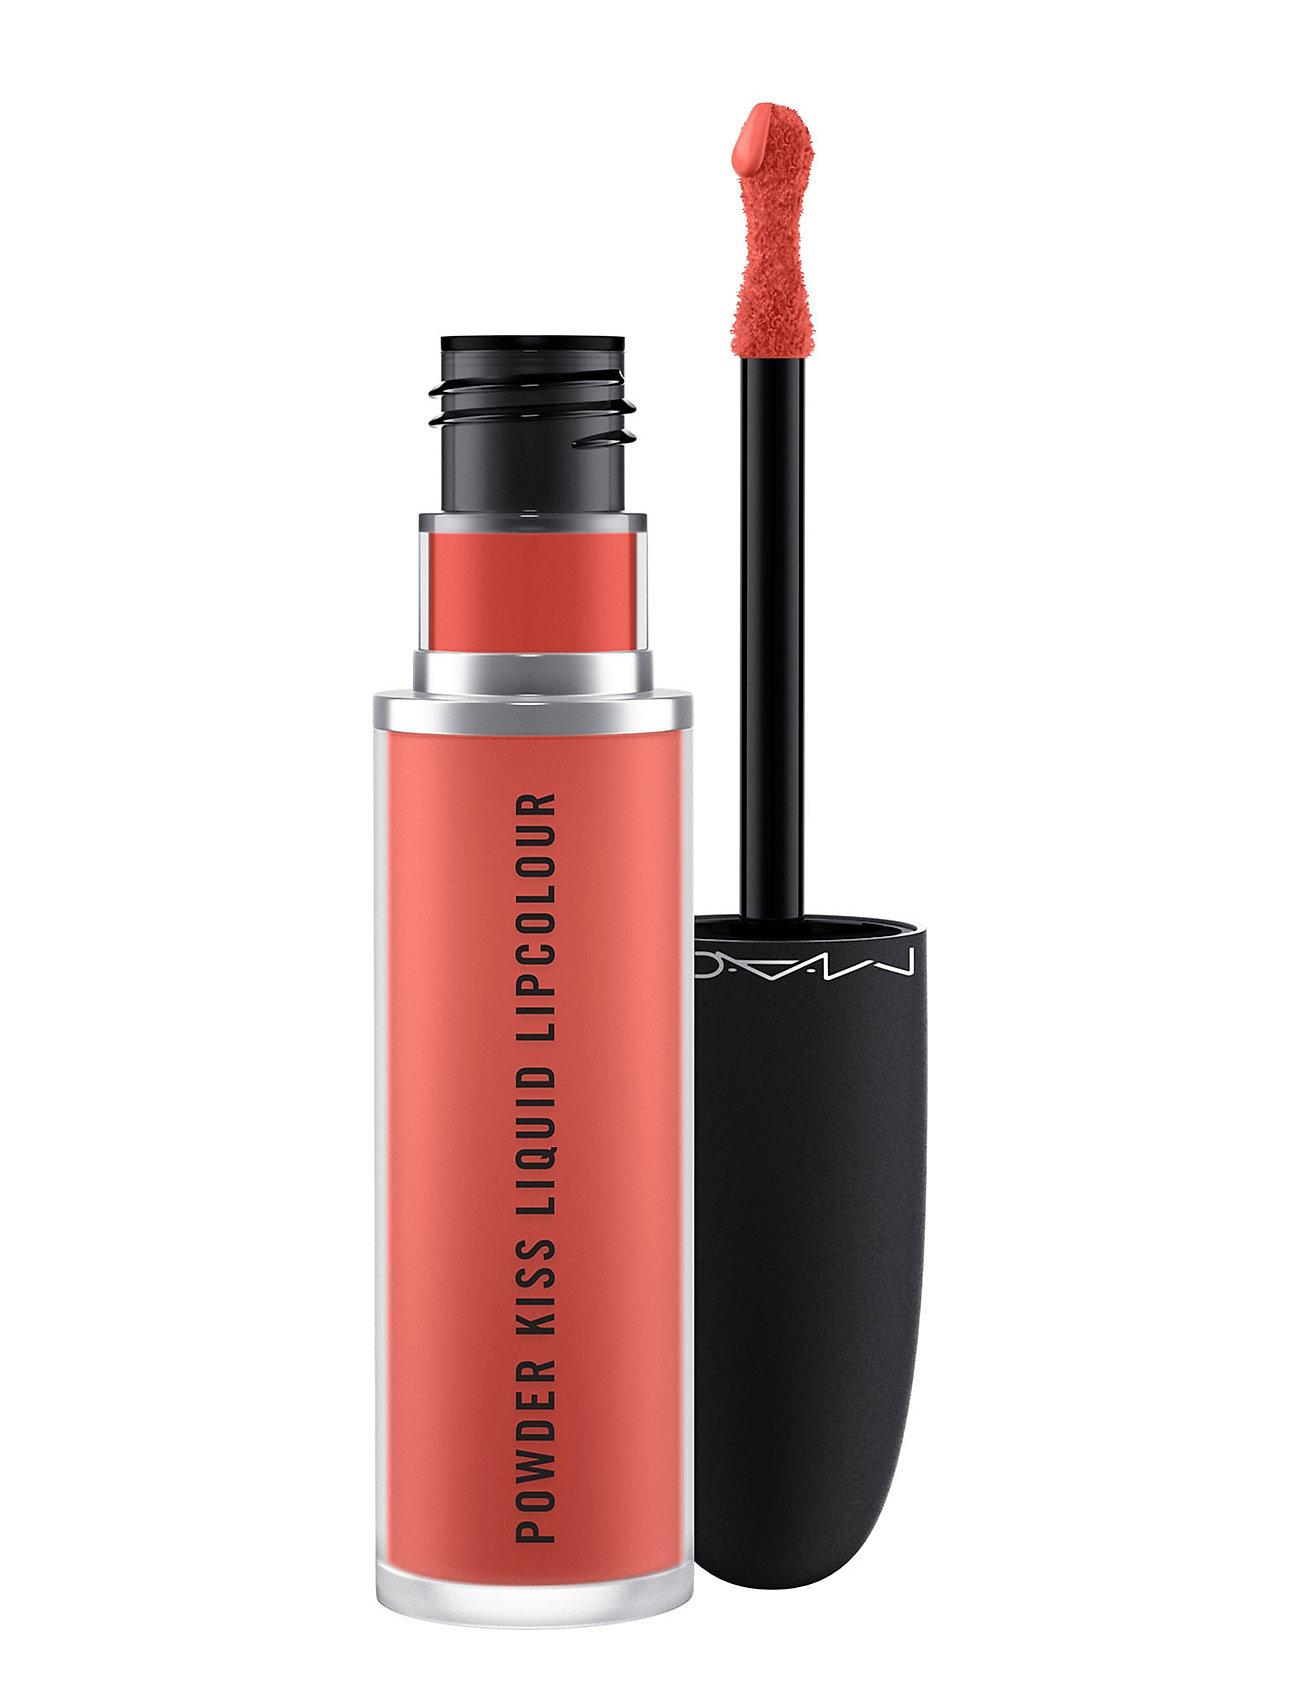 Image of Powder Kiss Liquid Lipcolour Lipgloss Makeup Rød M.A.C. (3406304267)